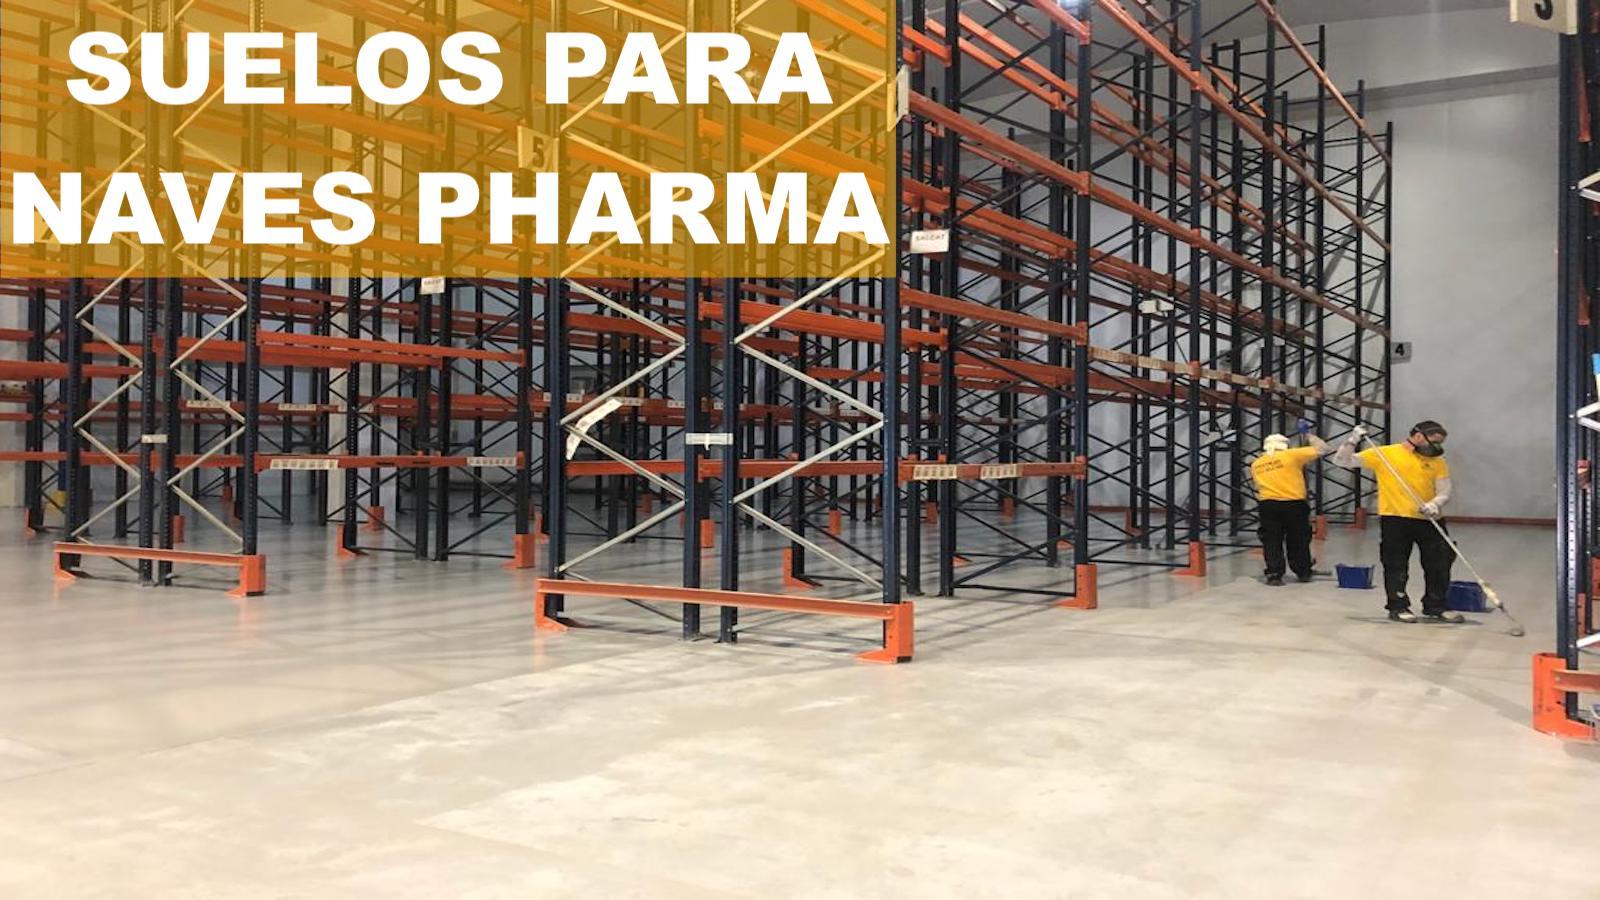 Suelos de resina epoxi para naves pharma